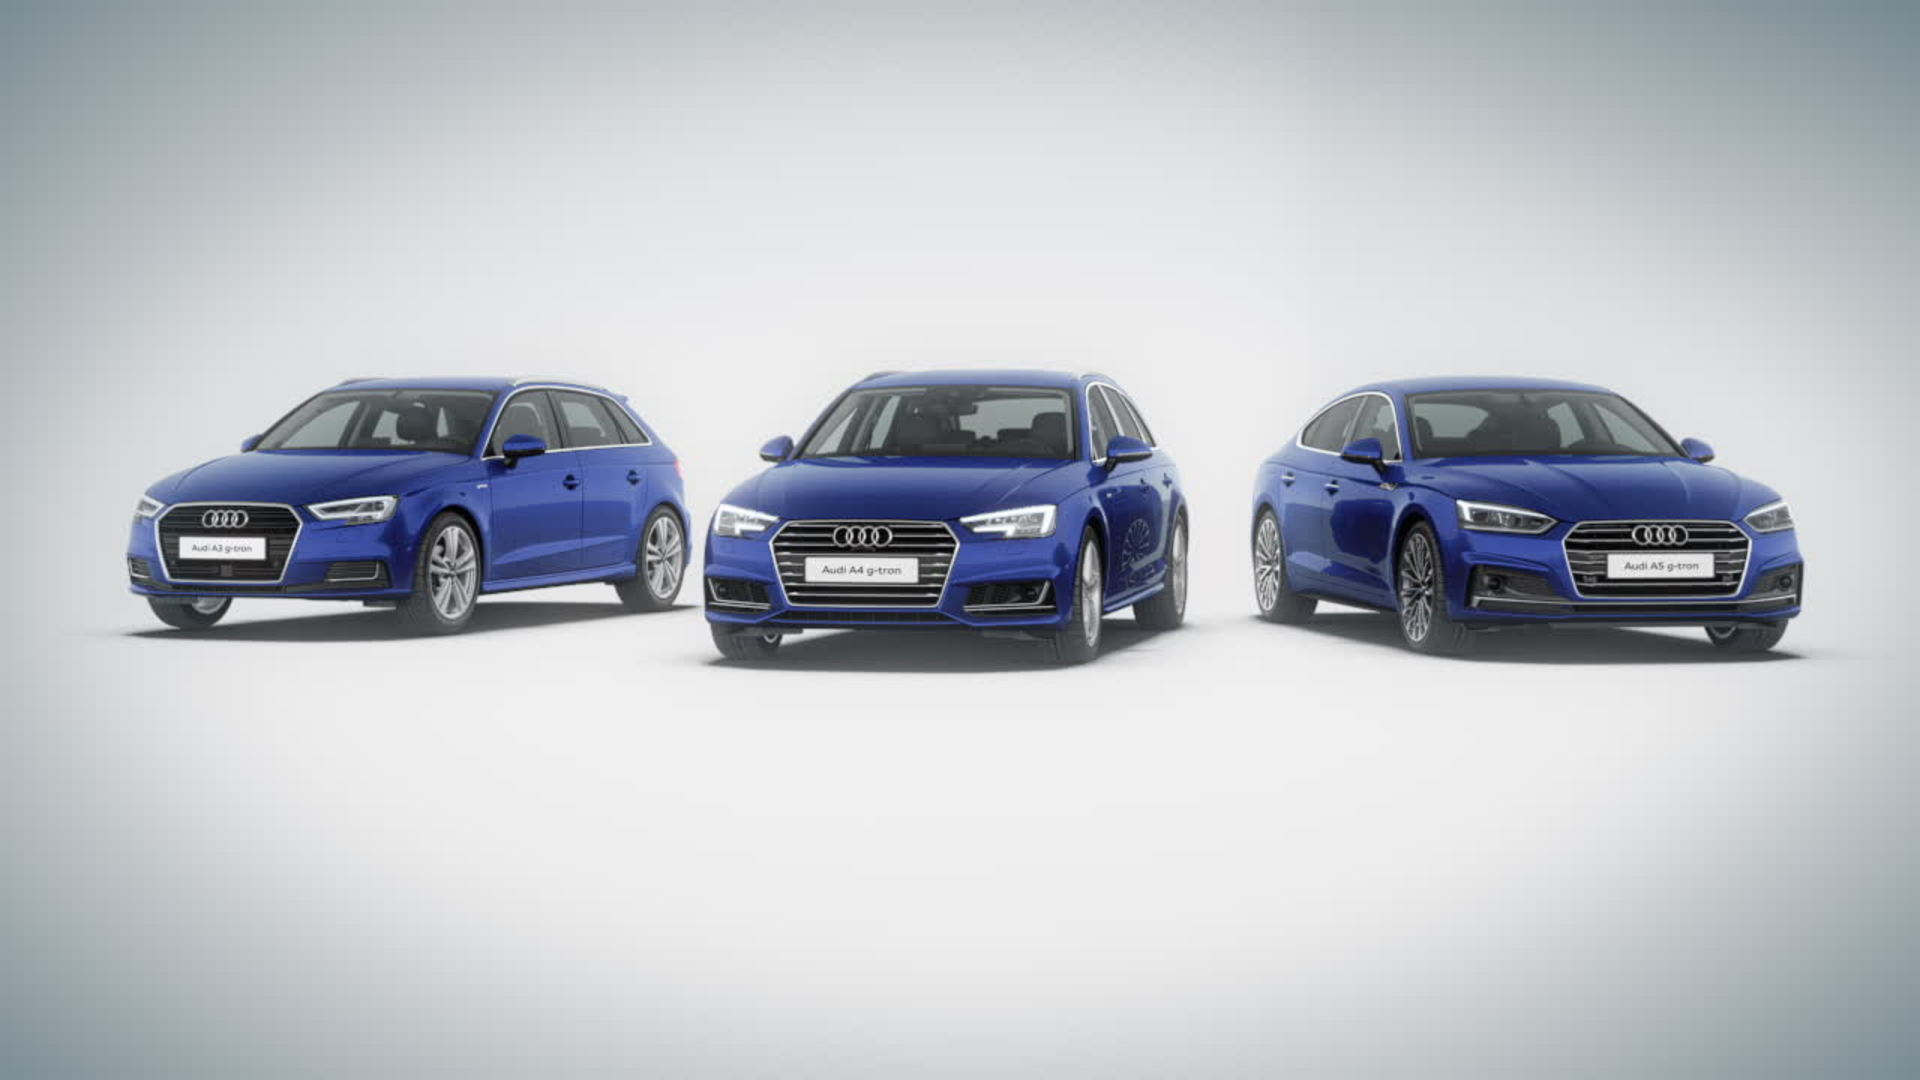 Audi g-tron long distance mobility Audi e-gas - Animation